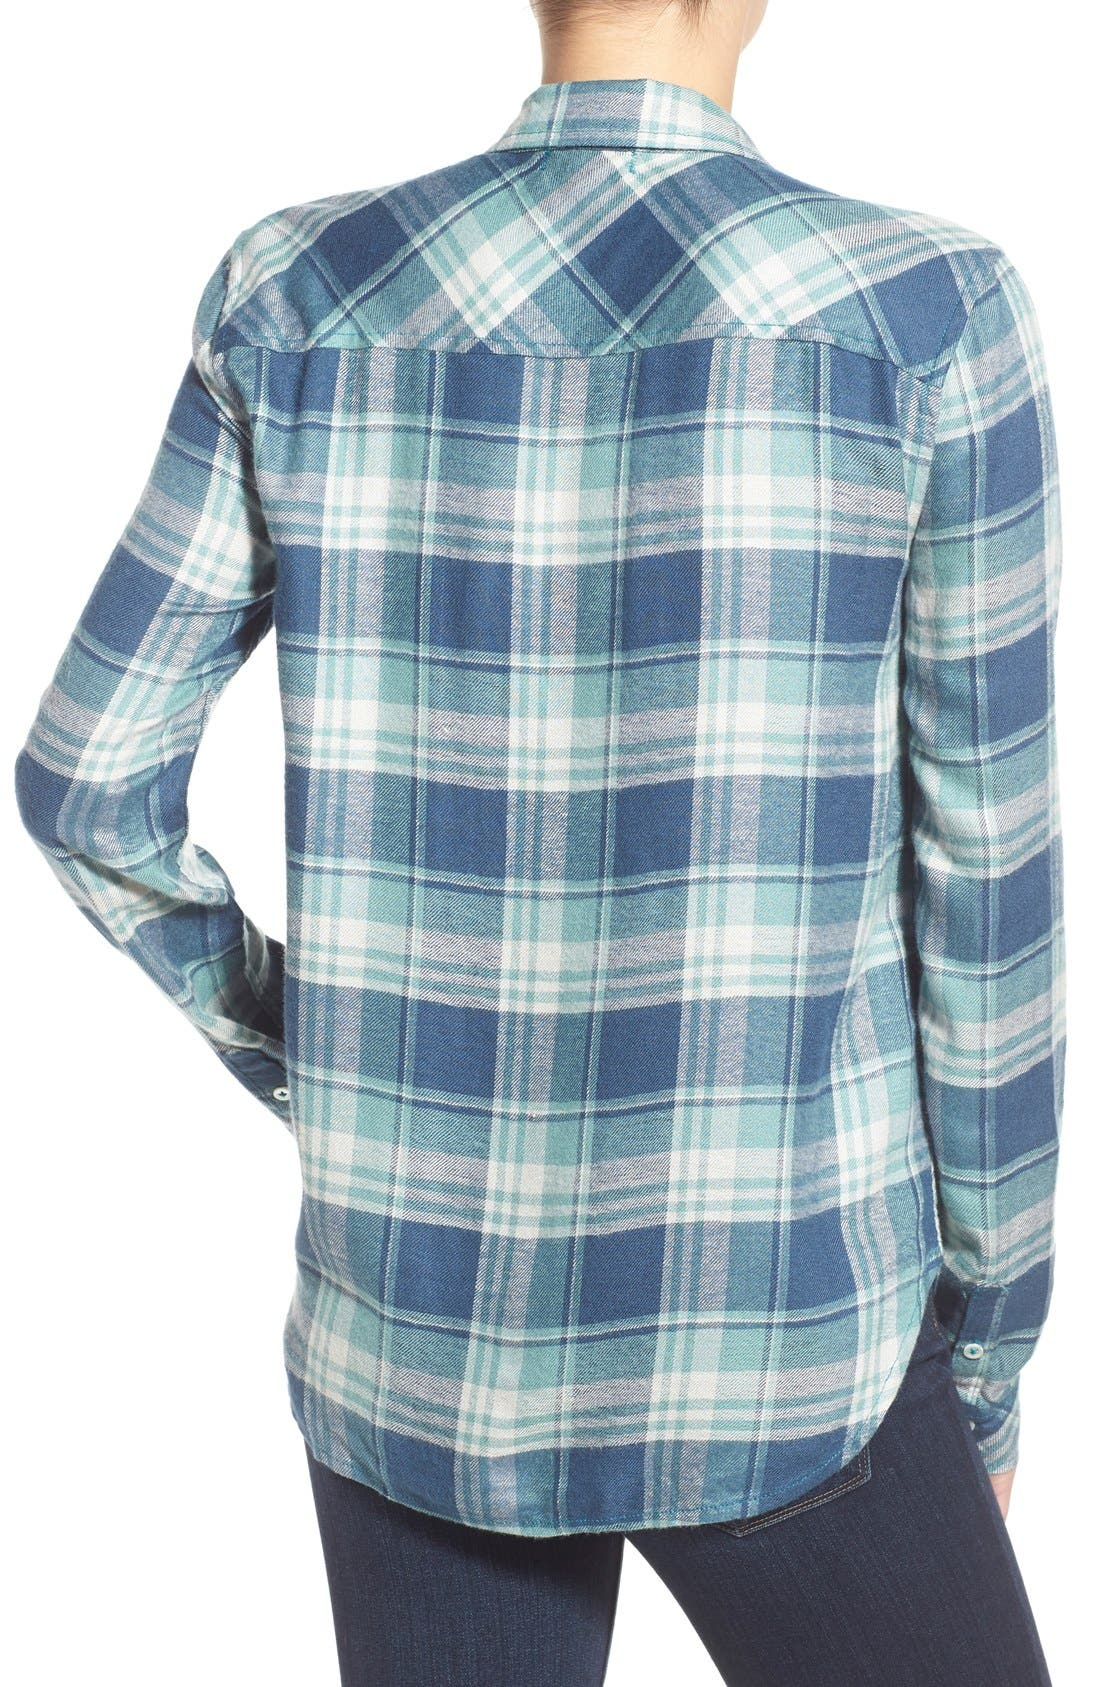 Alternate Image 2  - Paige Denim 'Trudy' Plaid Shirt